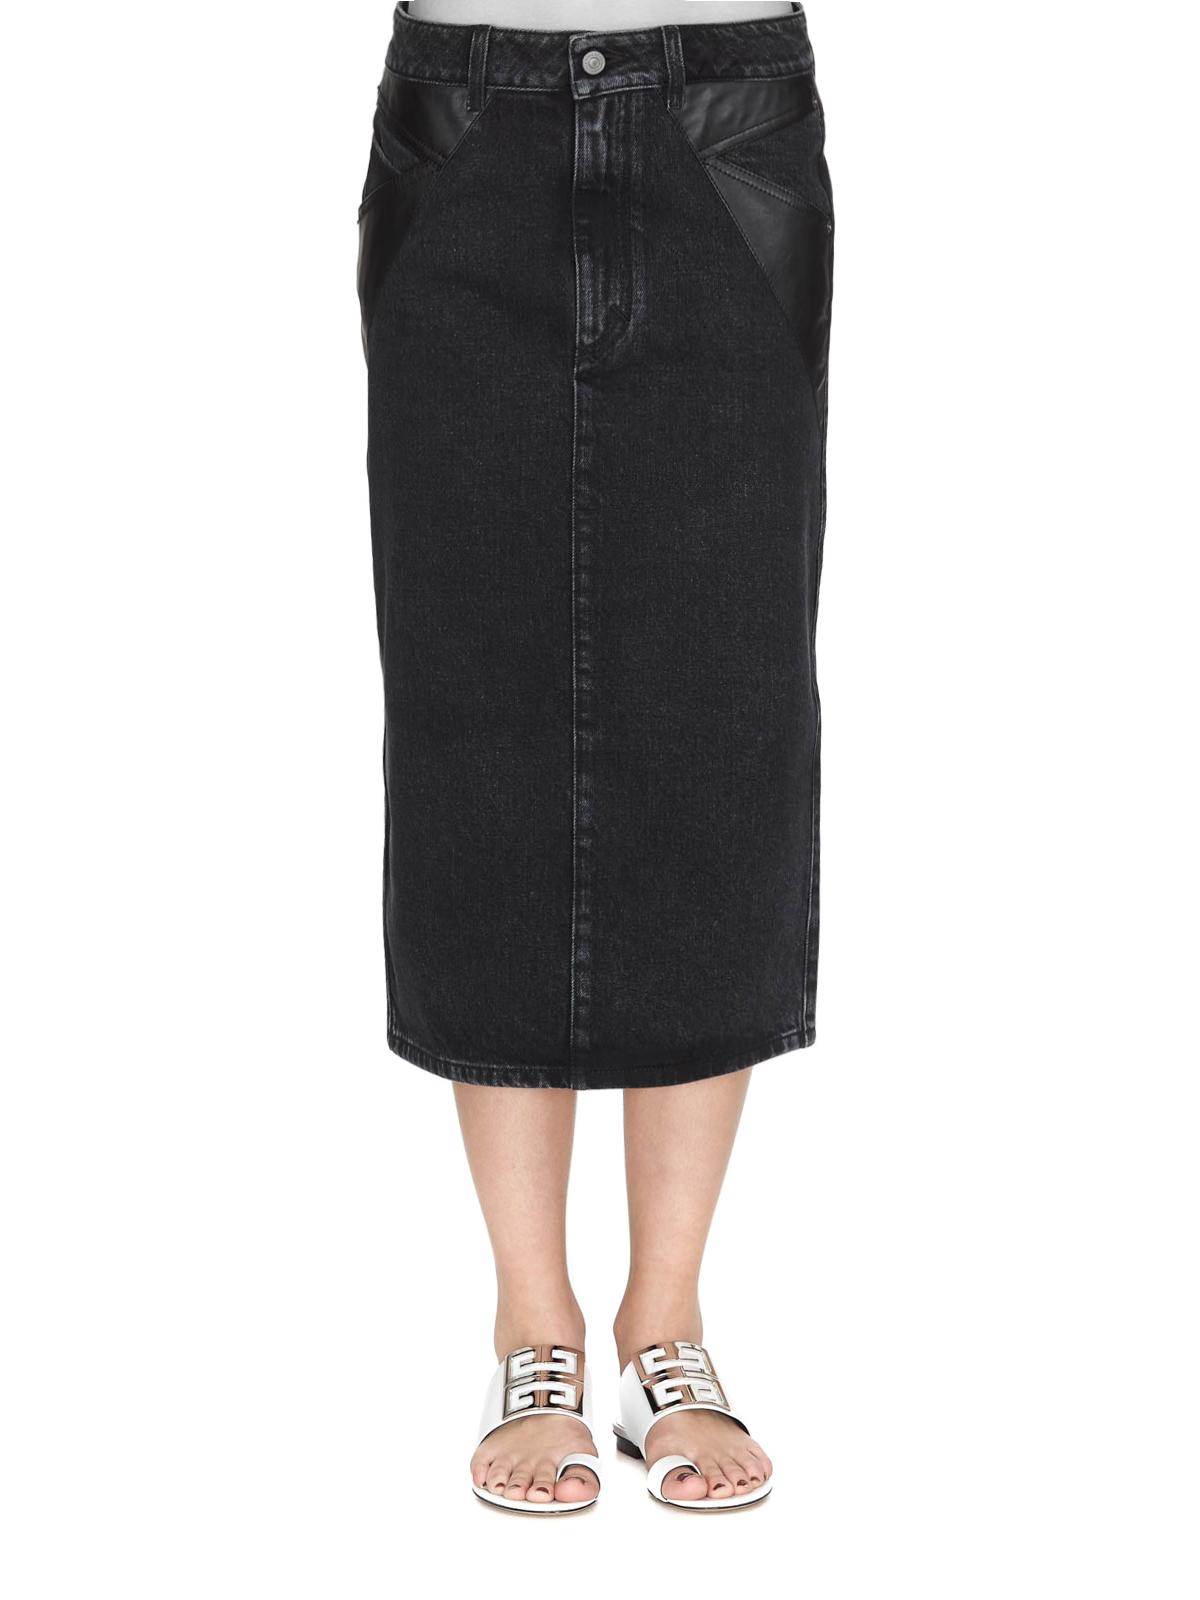 a8939383e iKRIX GIVENCHY: Knee length skirts & Midi - Black denim and leather pencil  midi skirt